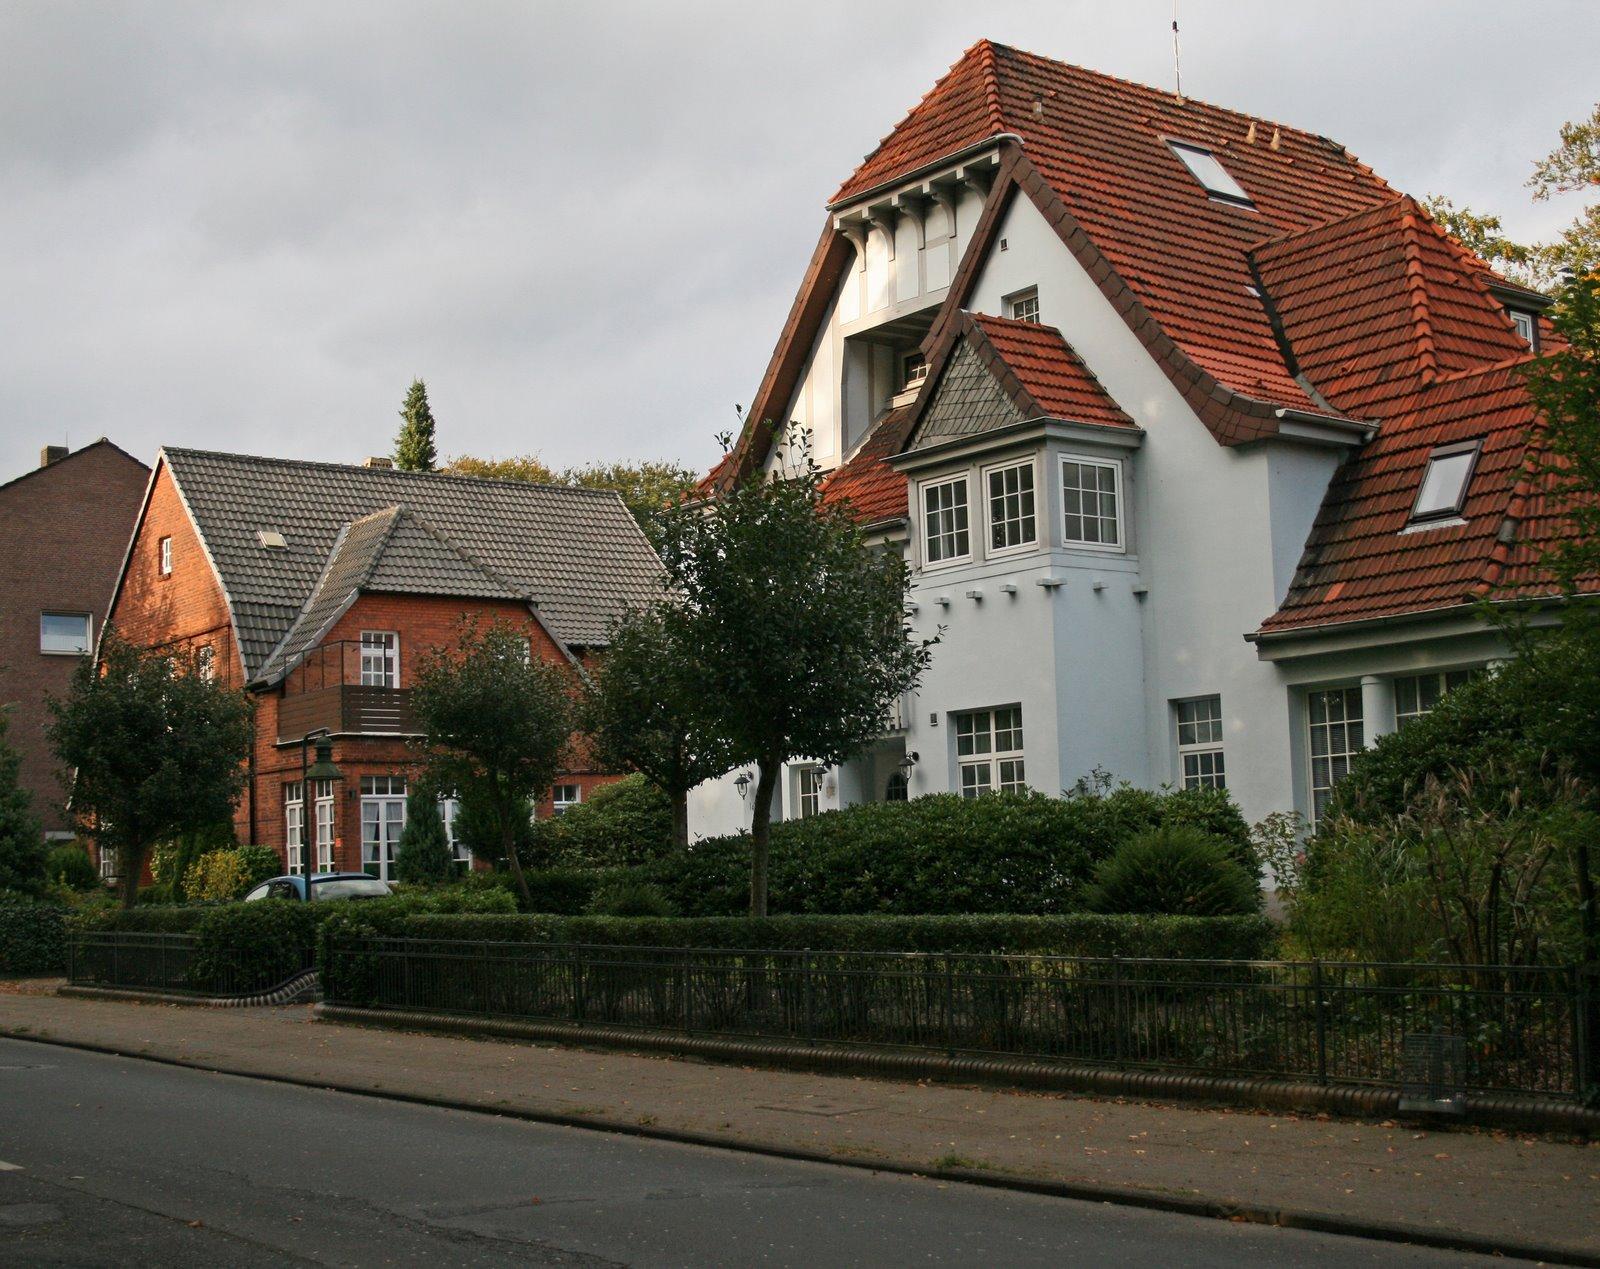 Bahnhofstraße 16 in Osterholz-Scharmbeck